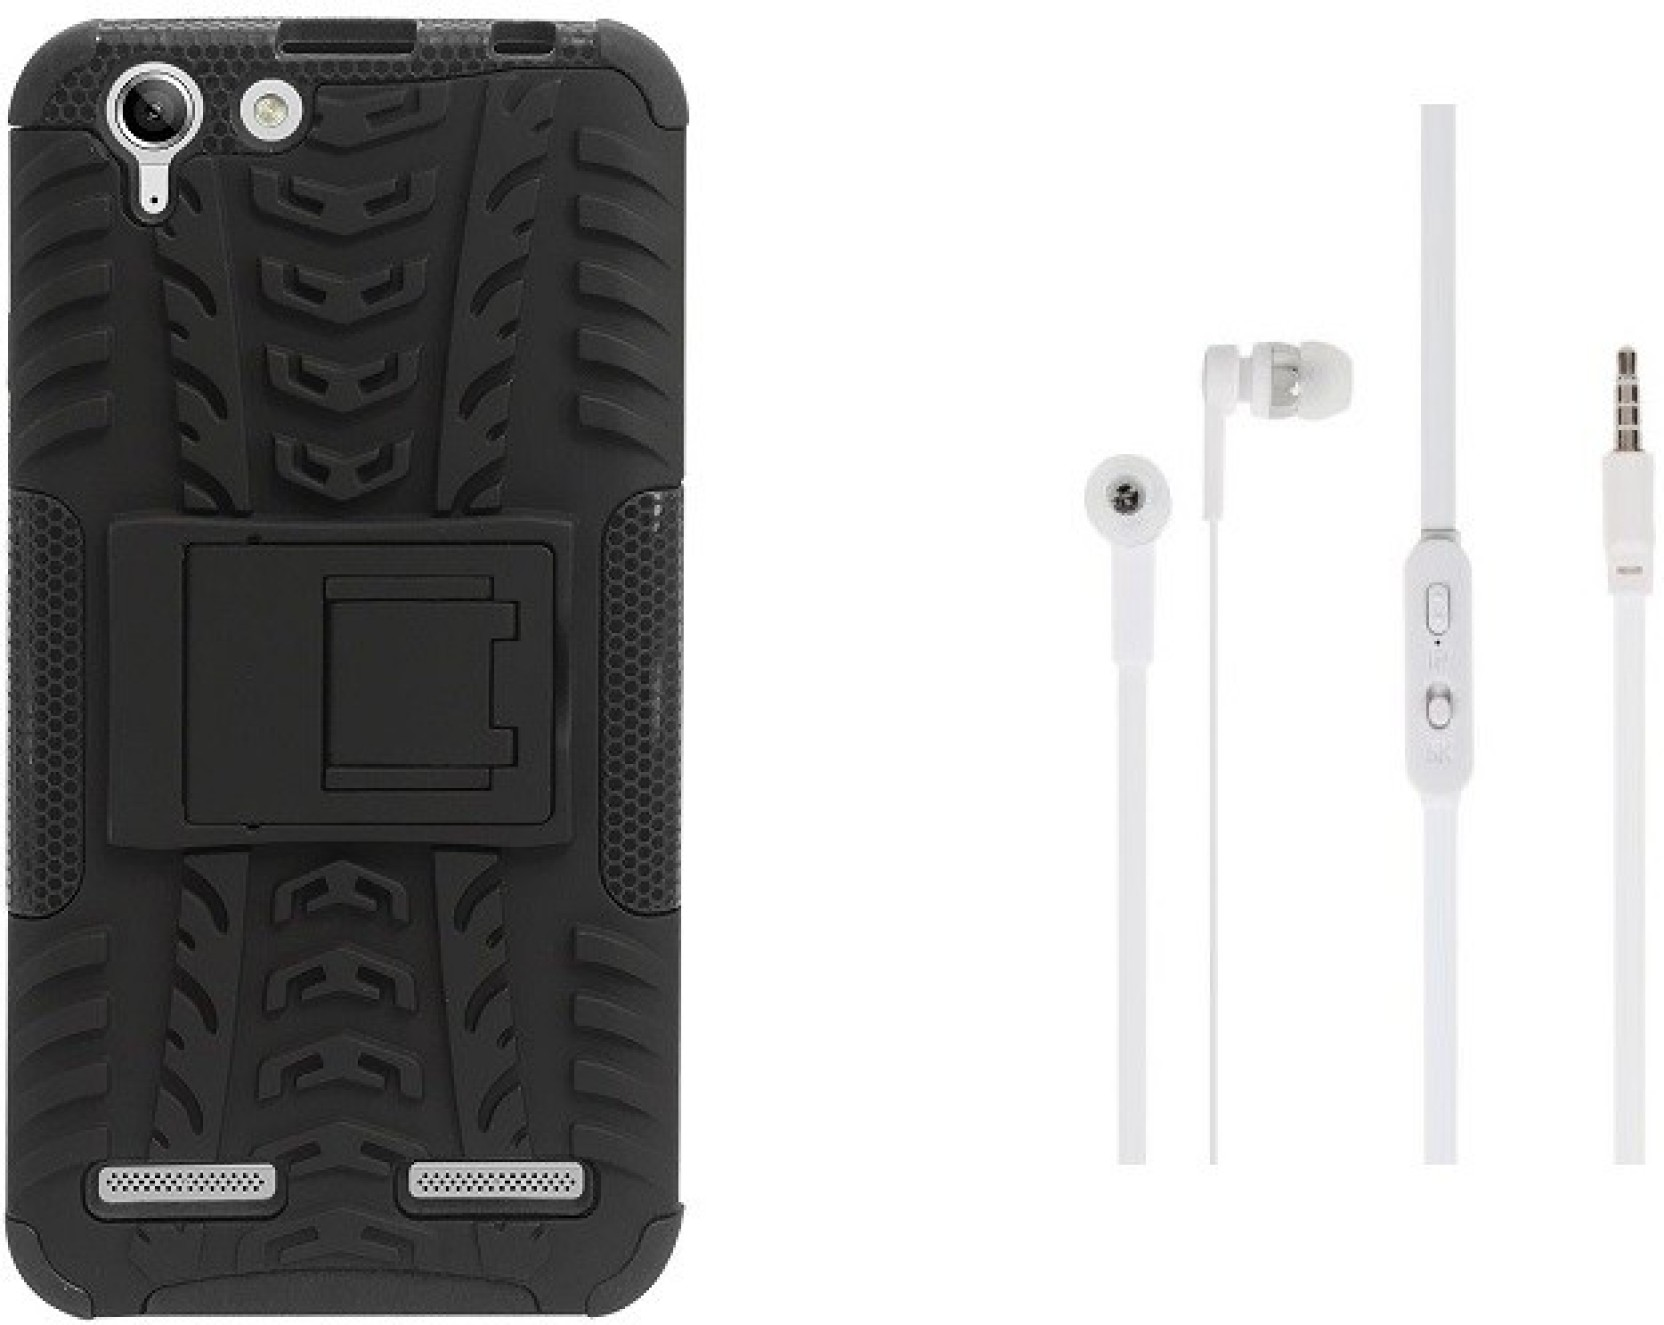 Besttalk Cover Accessory Combo For Lenovo Vibe K5 Plus Accessories Bt 2 Home